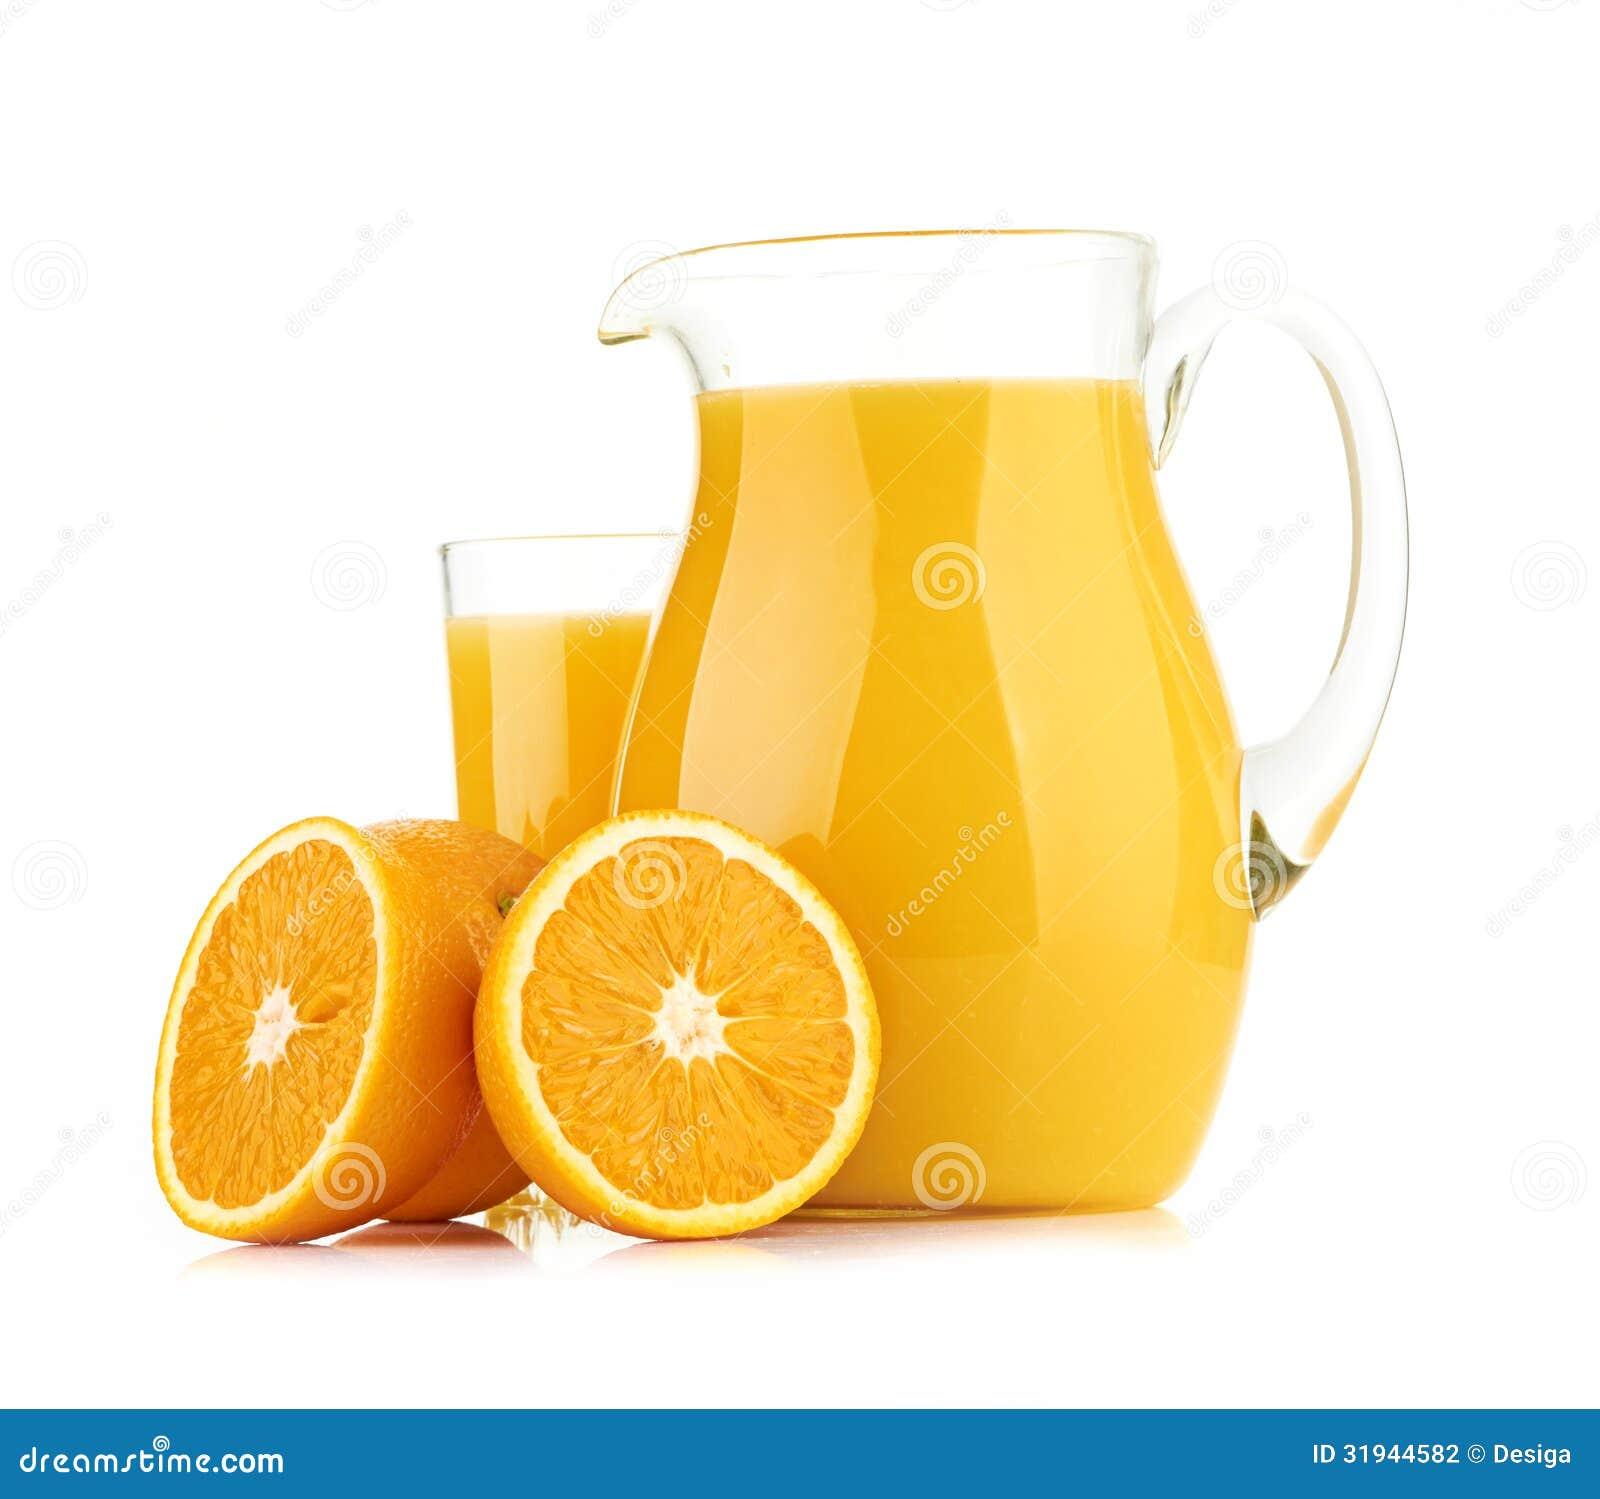 orange juice jug and glass stock images  image  - jug glass of orange juice and orange fruits stock photography